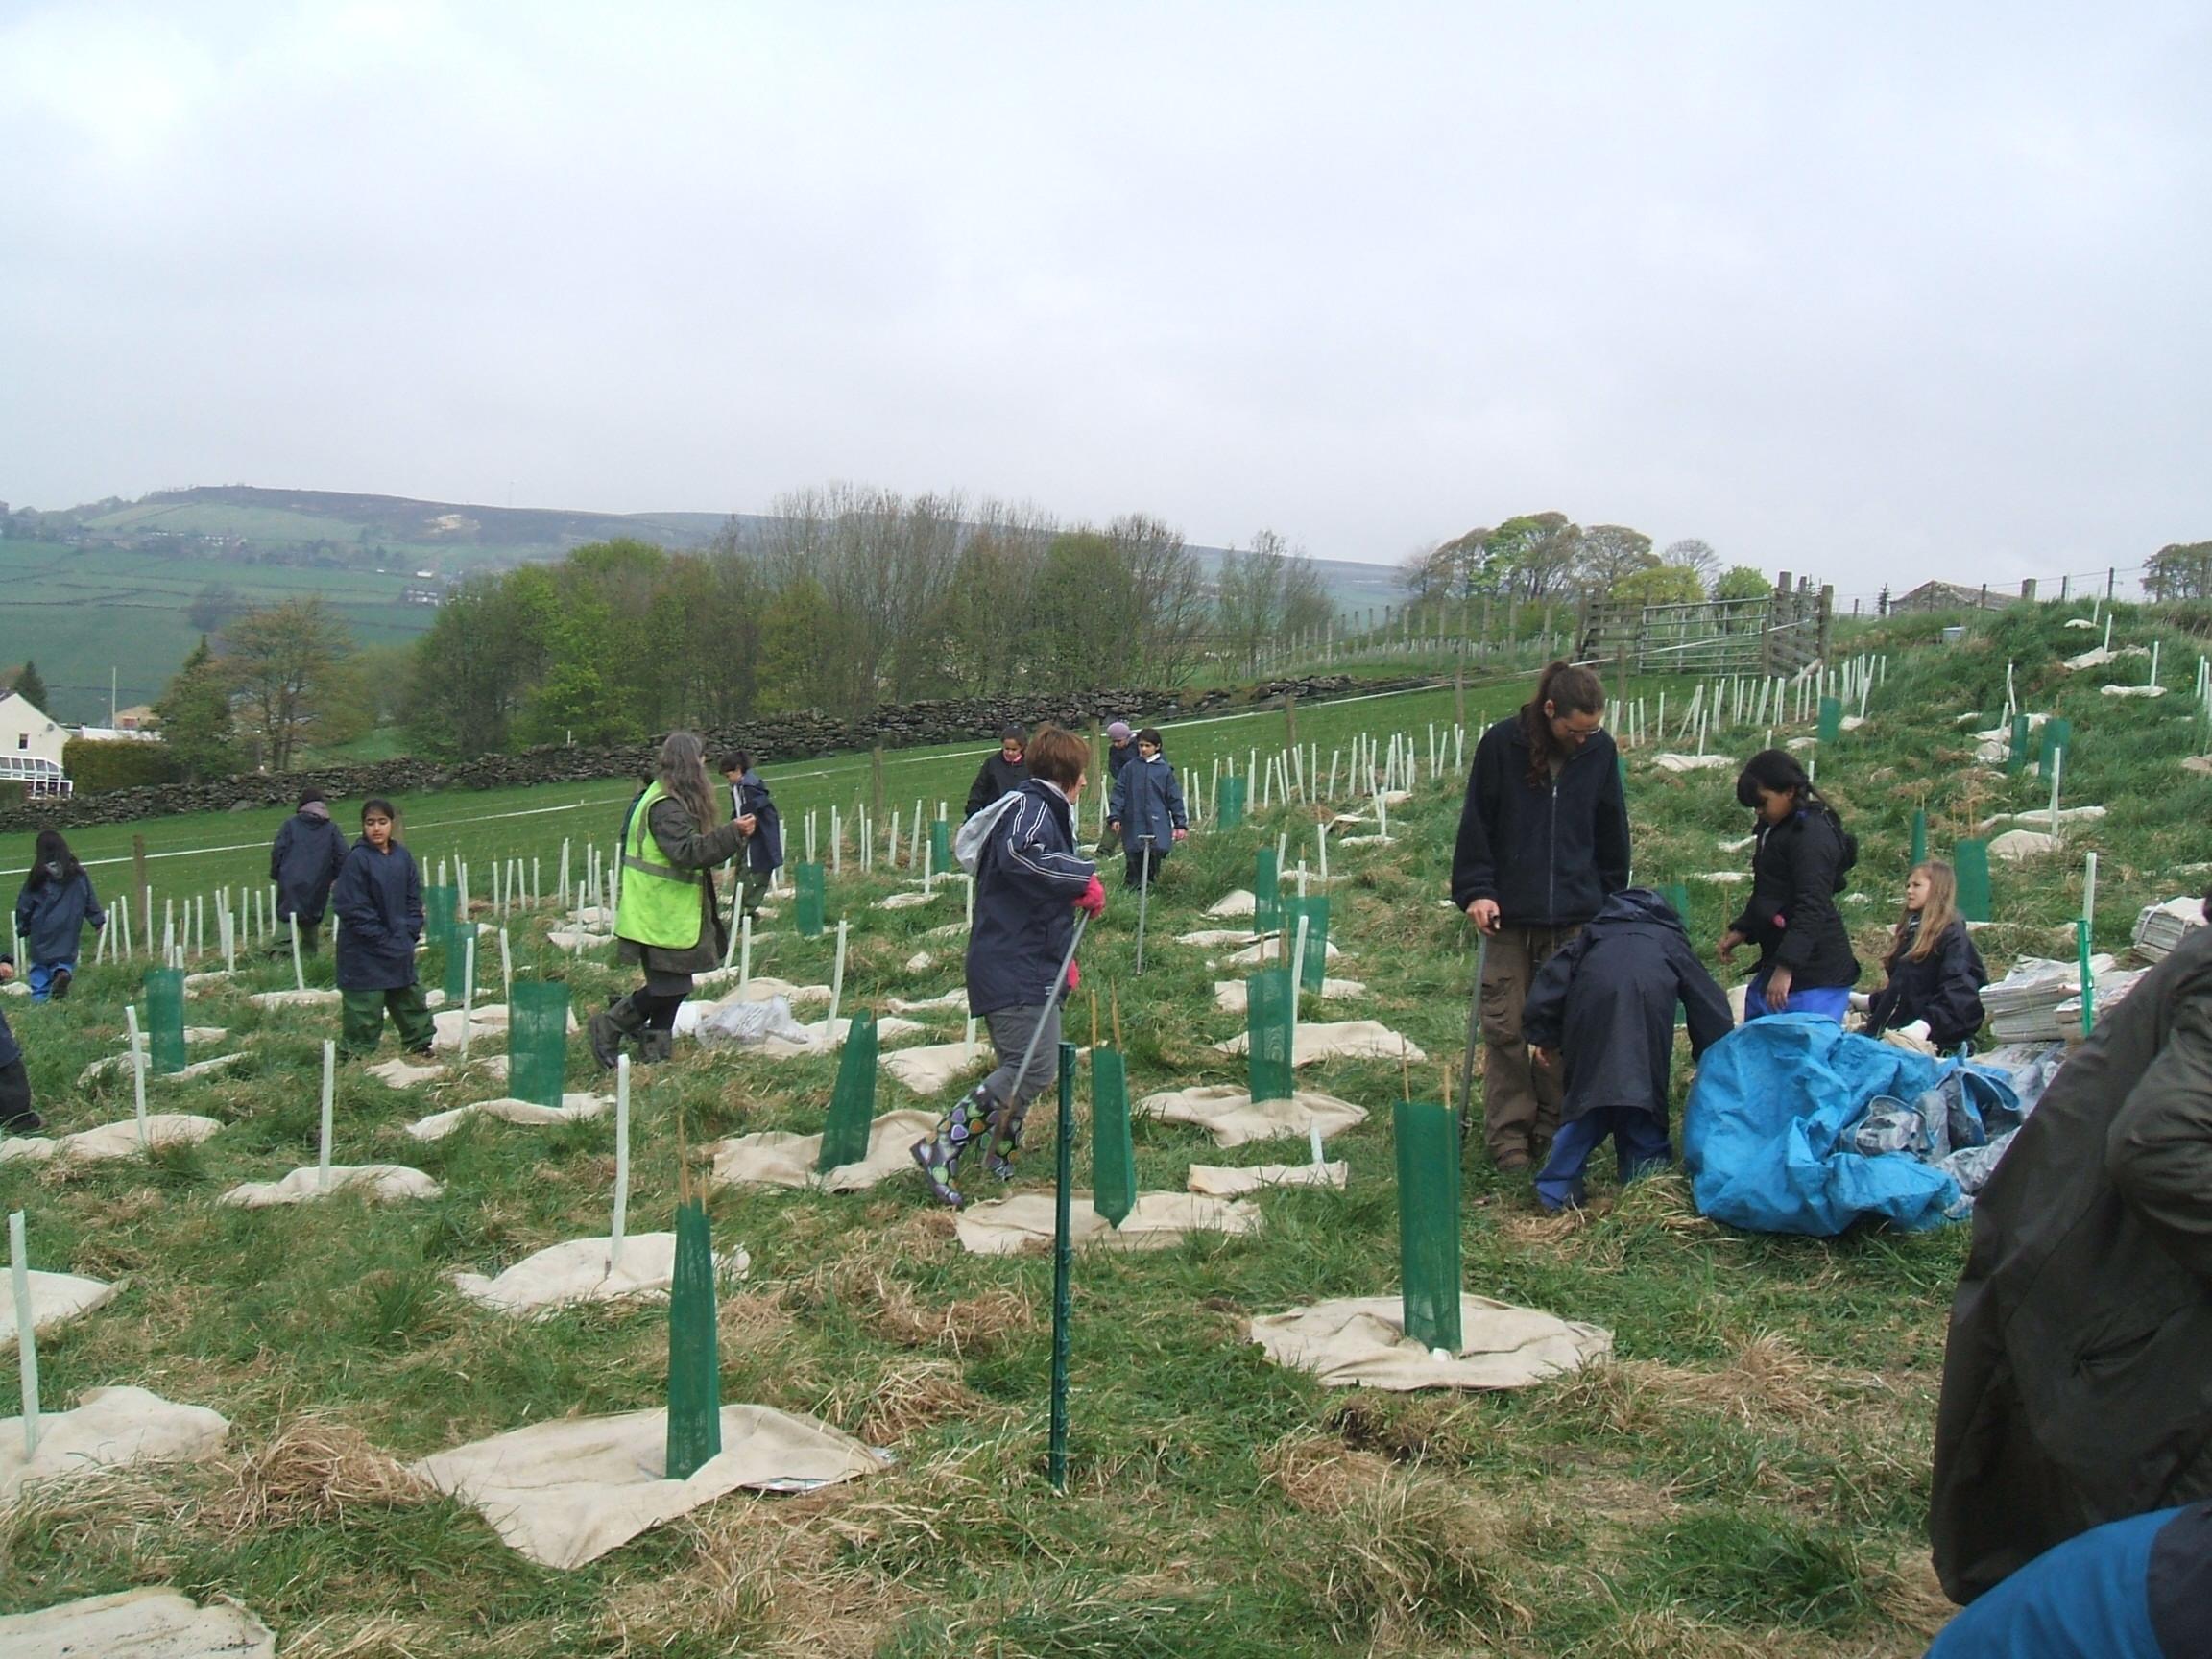 Planting trees at Great Burlees Farm